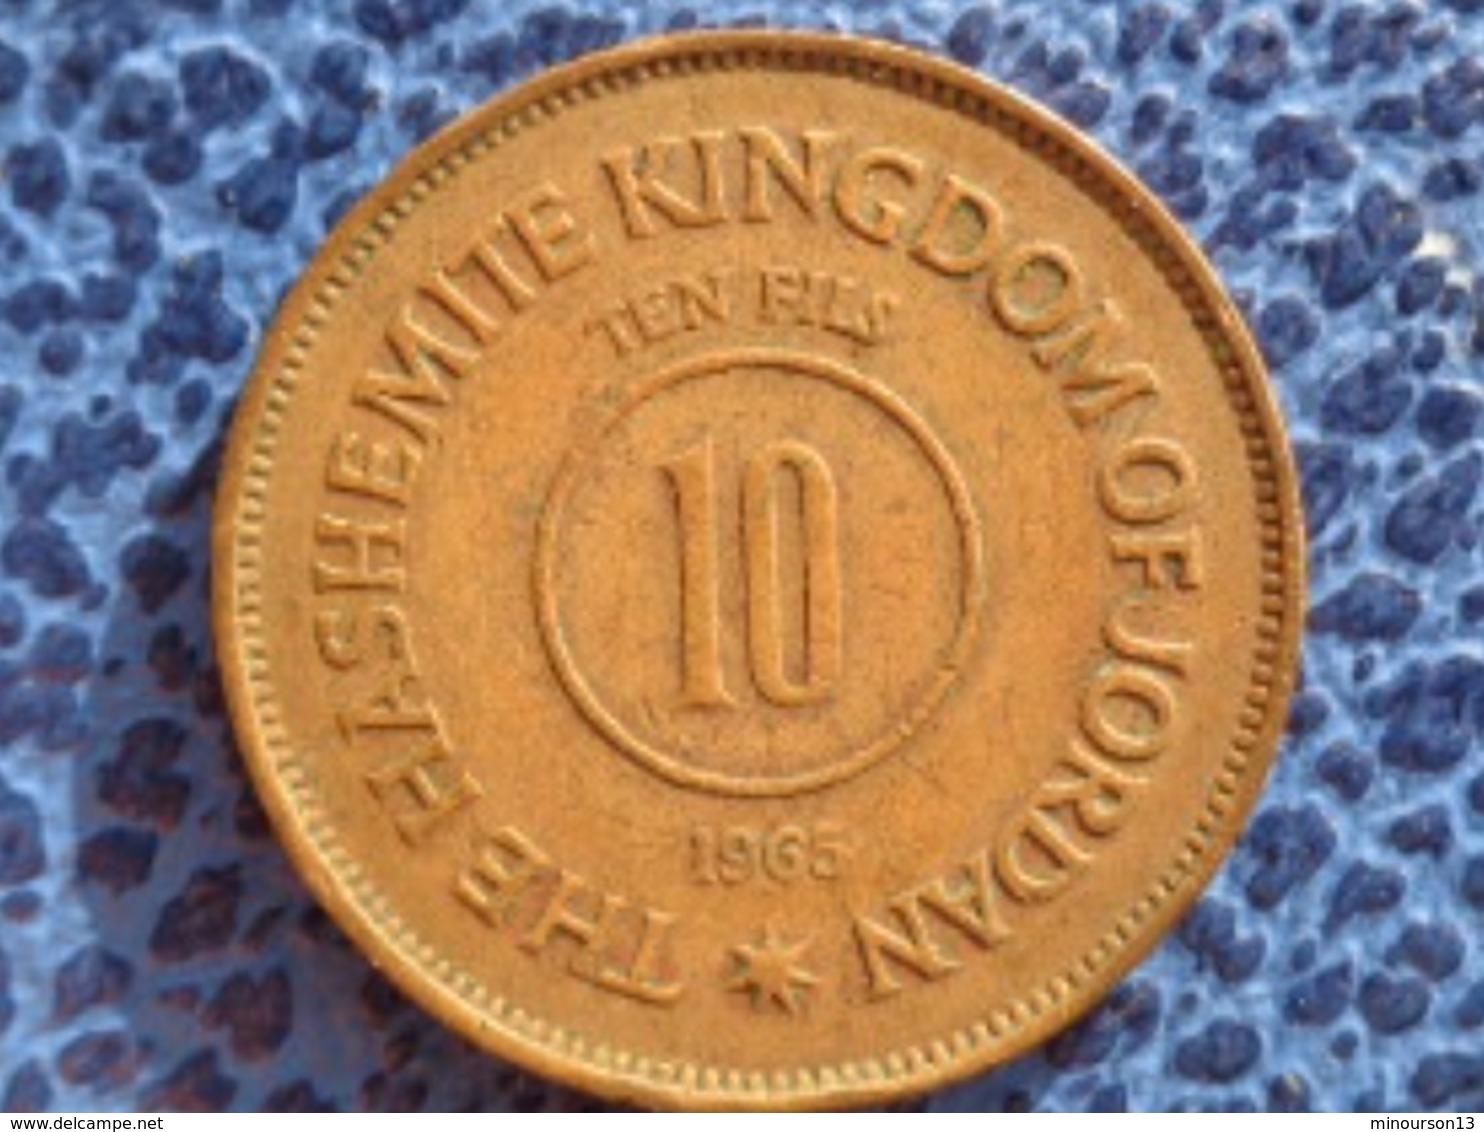 THE HASHEMITE KINGDOM OF JORDAN : 10 FILS 1965 - Jordanie